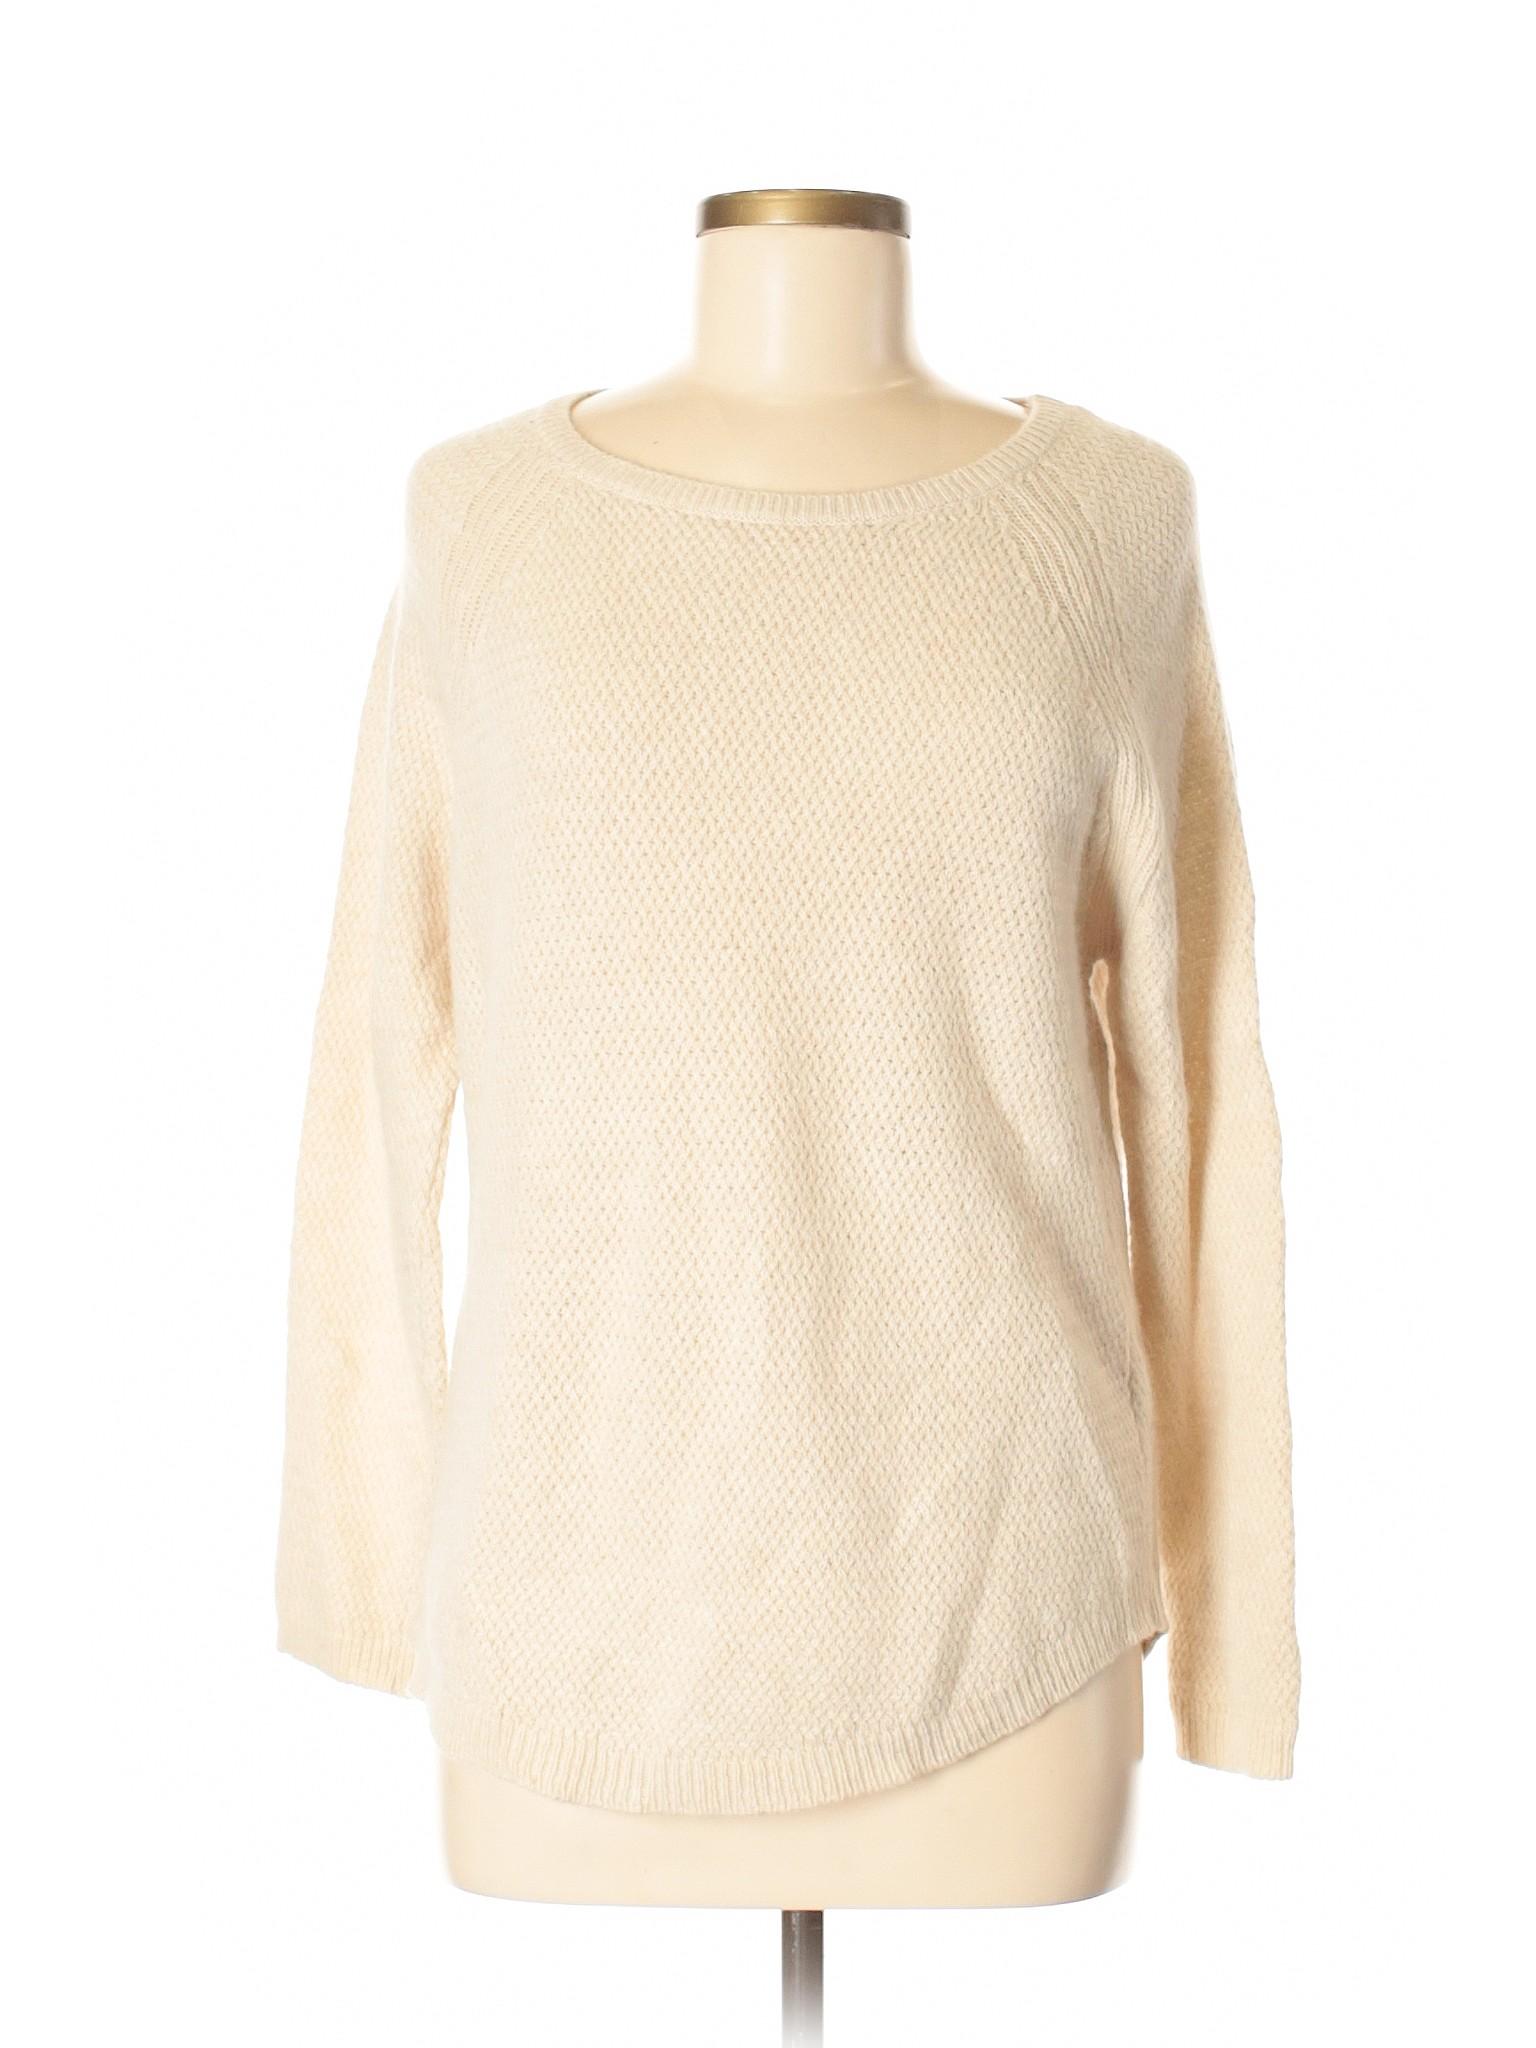 winter winter Sweater Zara Sweater Boutique Zara Sweater Pullover Boutique Zara Pullover Pullover Boutique winter Zara Boutique winter wA4qSn